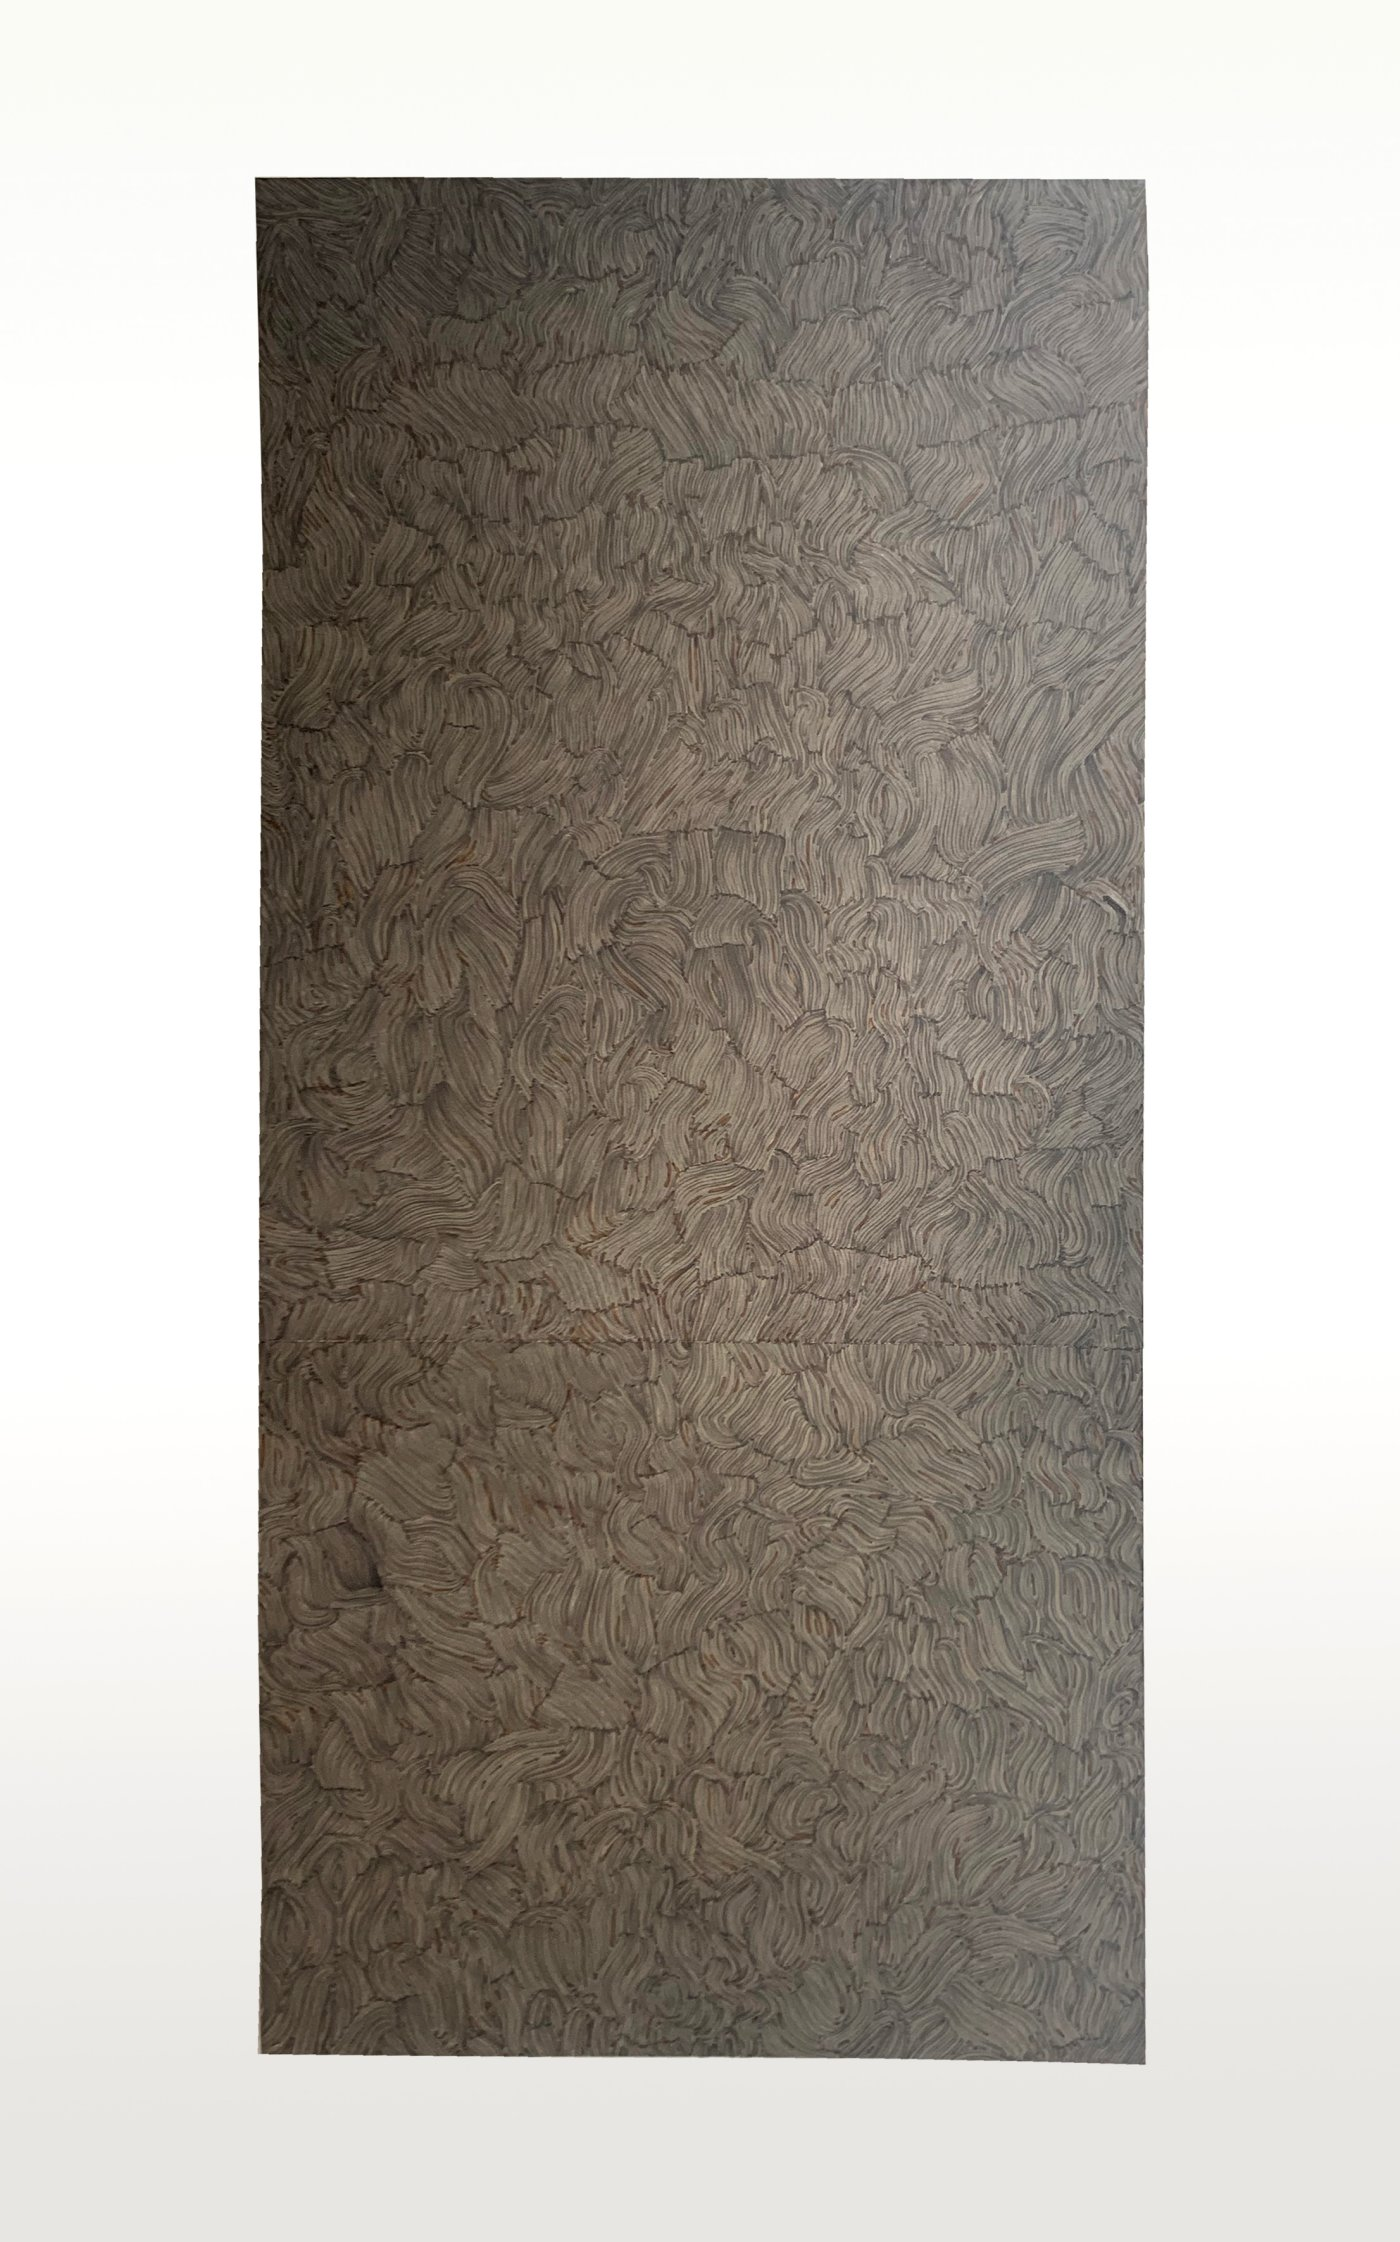 WG20 (sepia, umber, ivory black)